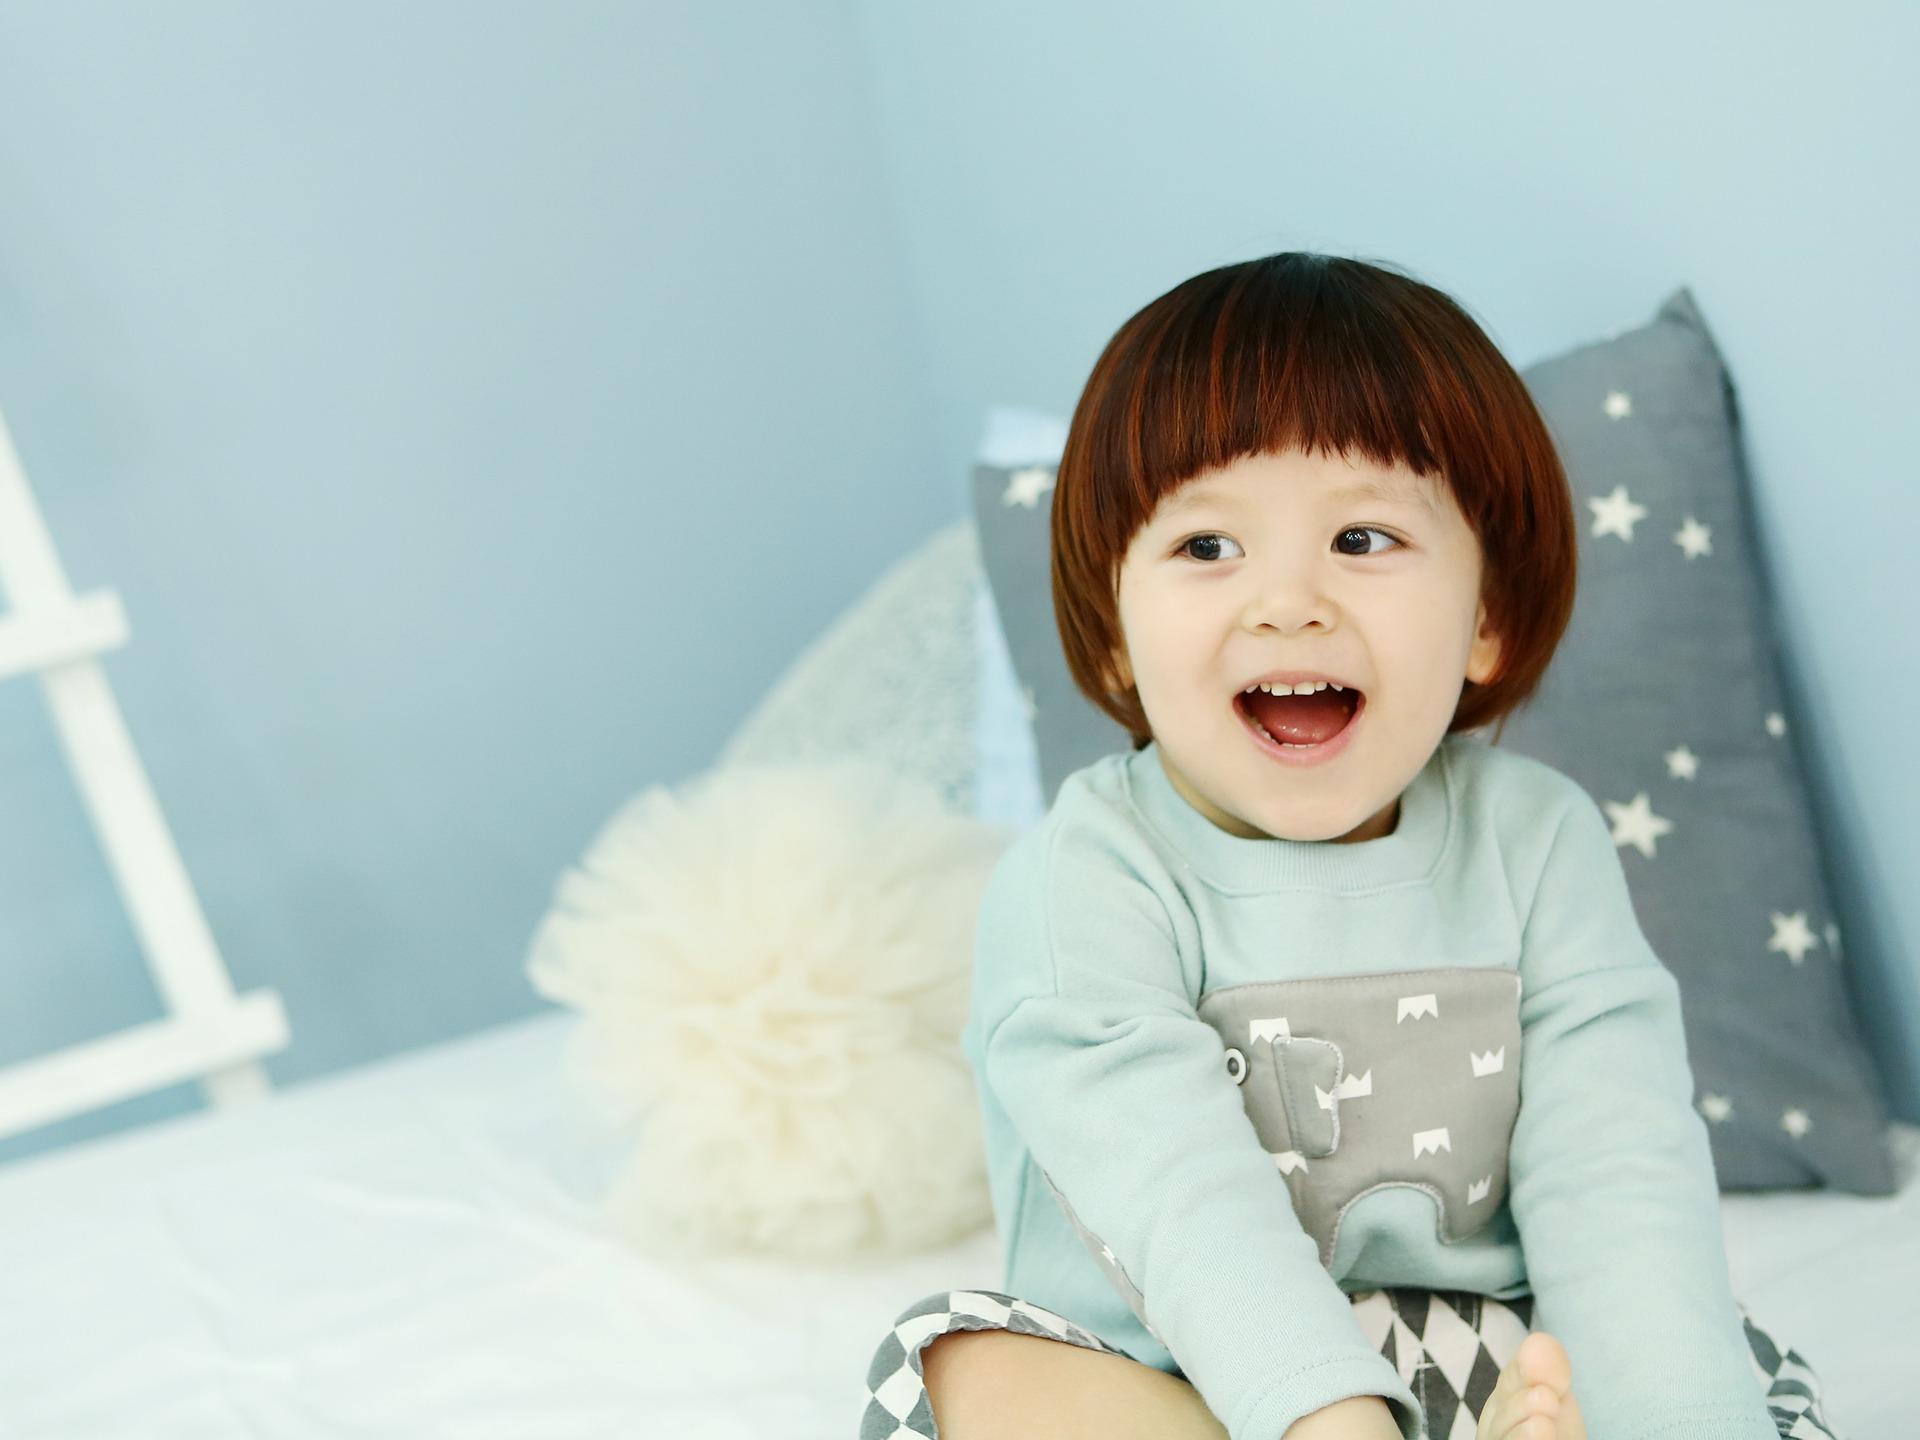 baby-models-1475058_1920